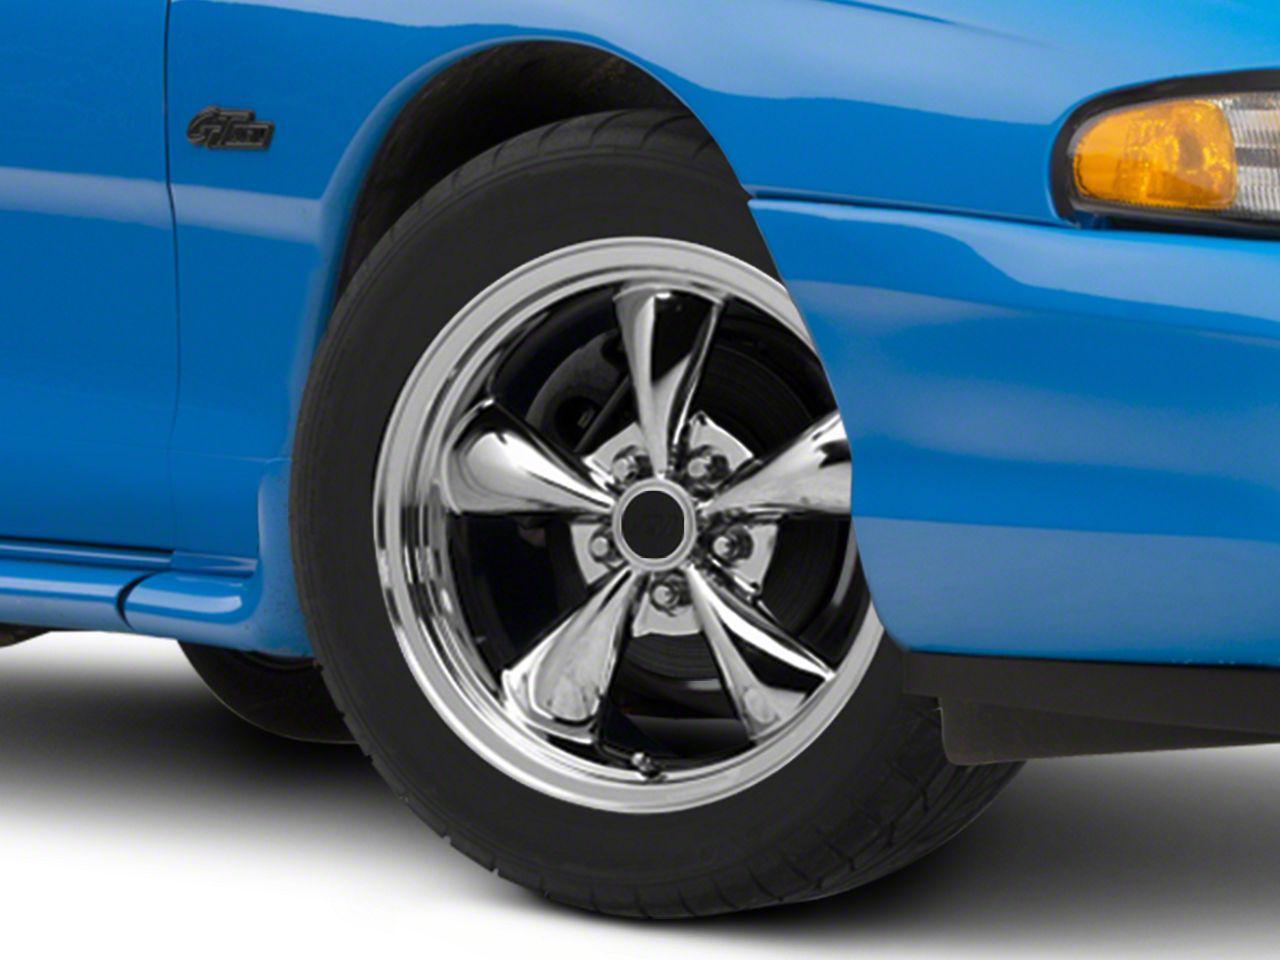 17 inch mustang wheels americanmuscle 2005 F150 Wheel Size 1994 1998 17 mustang wheels